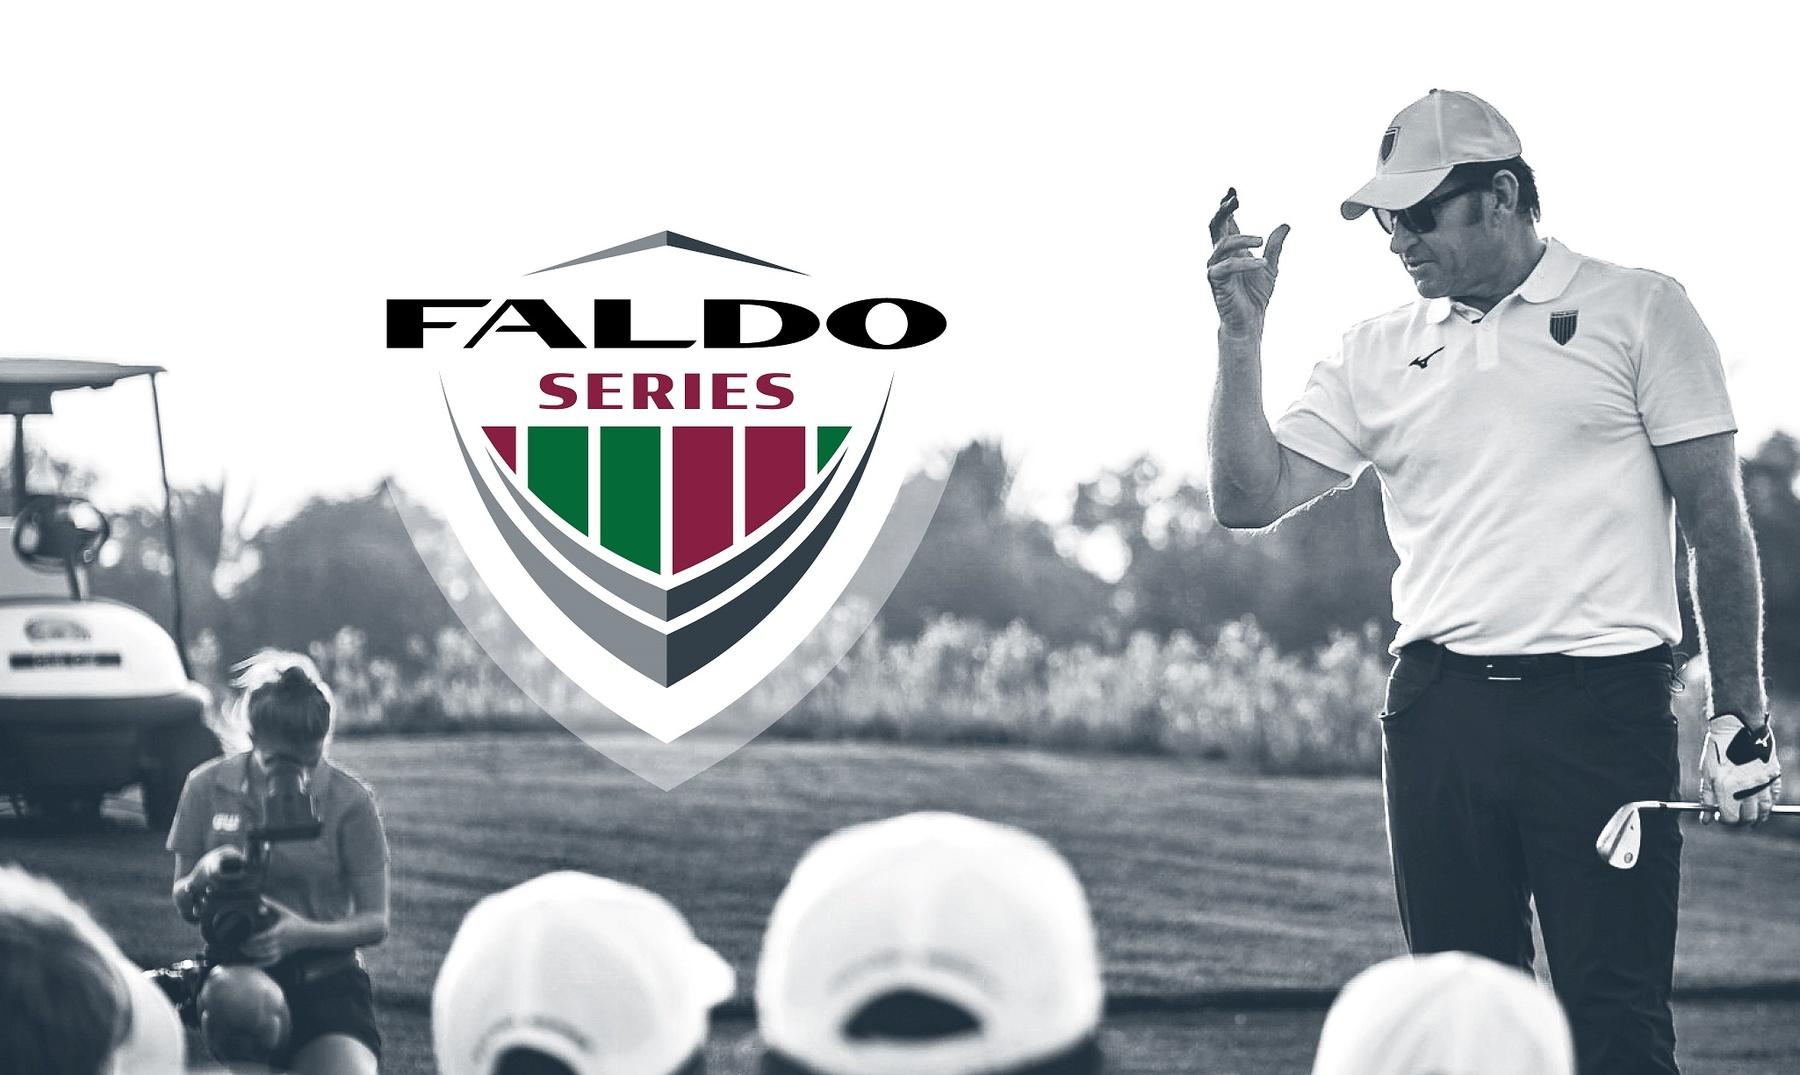 Sir Nick Faldo's global junior golf tournament receives a new logo and modernised branding